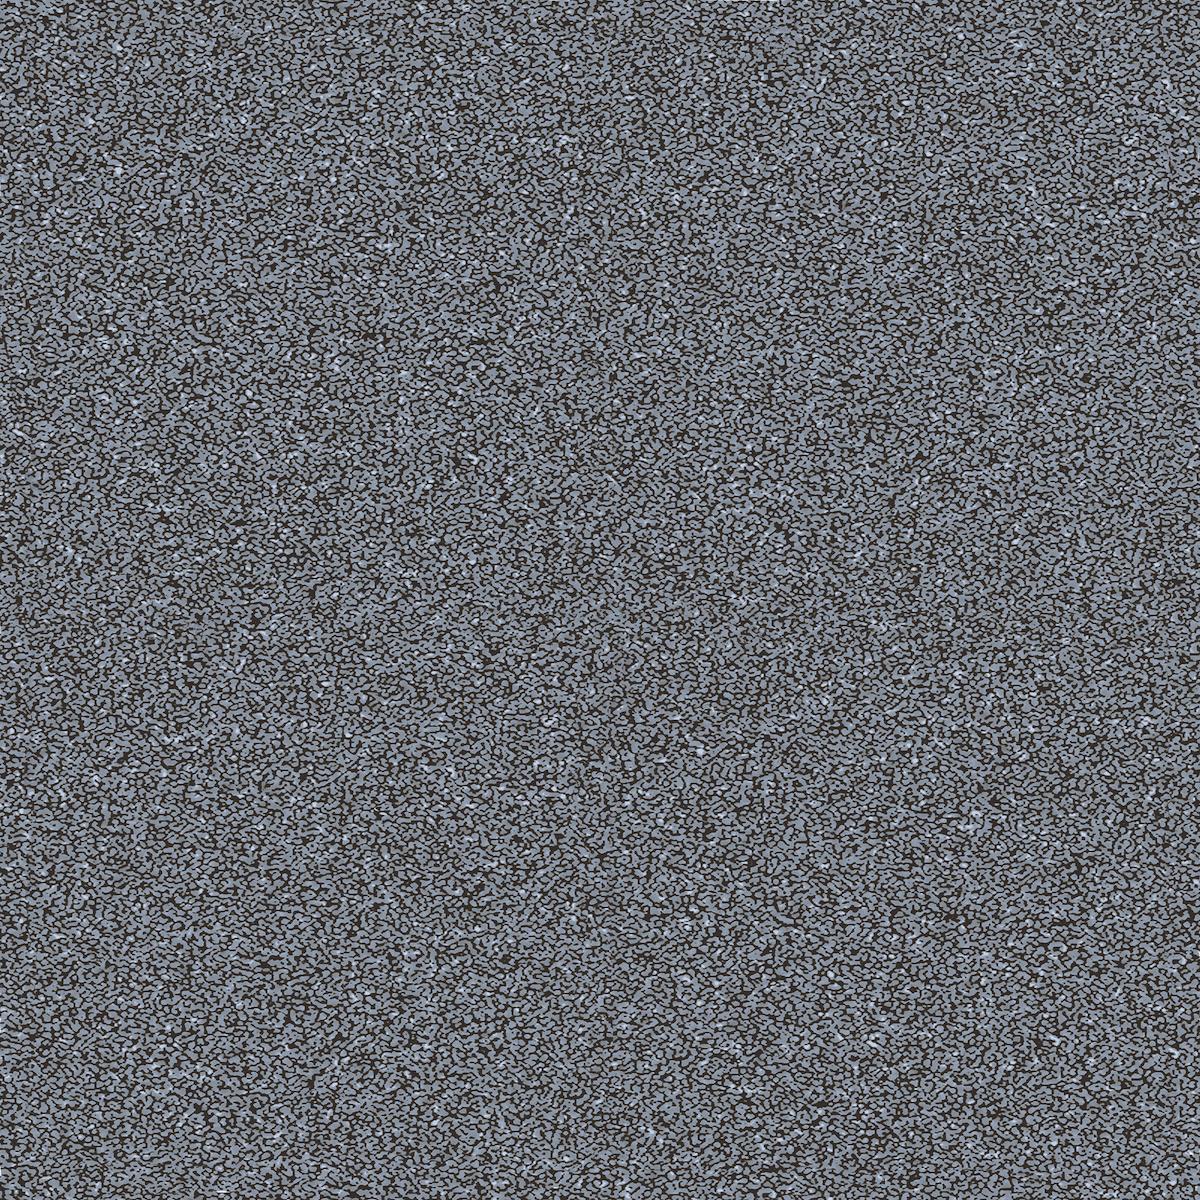 HRP Stone Slate DK